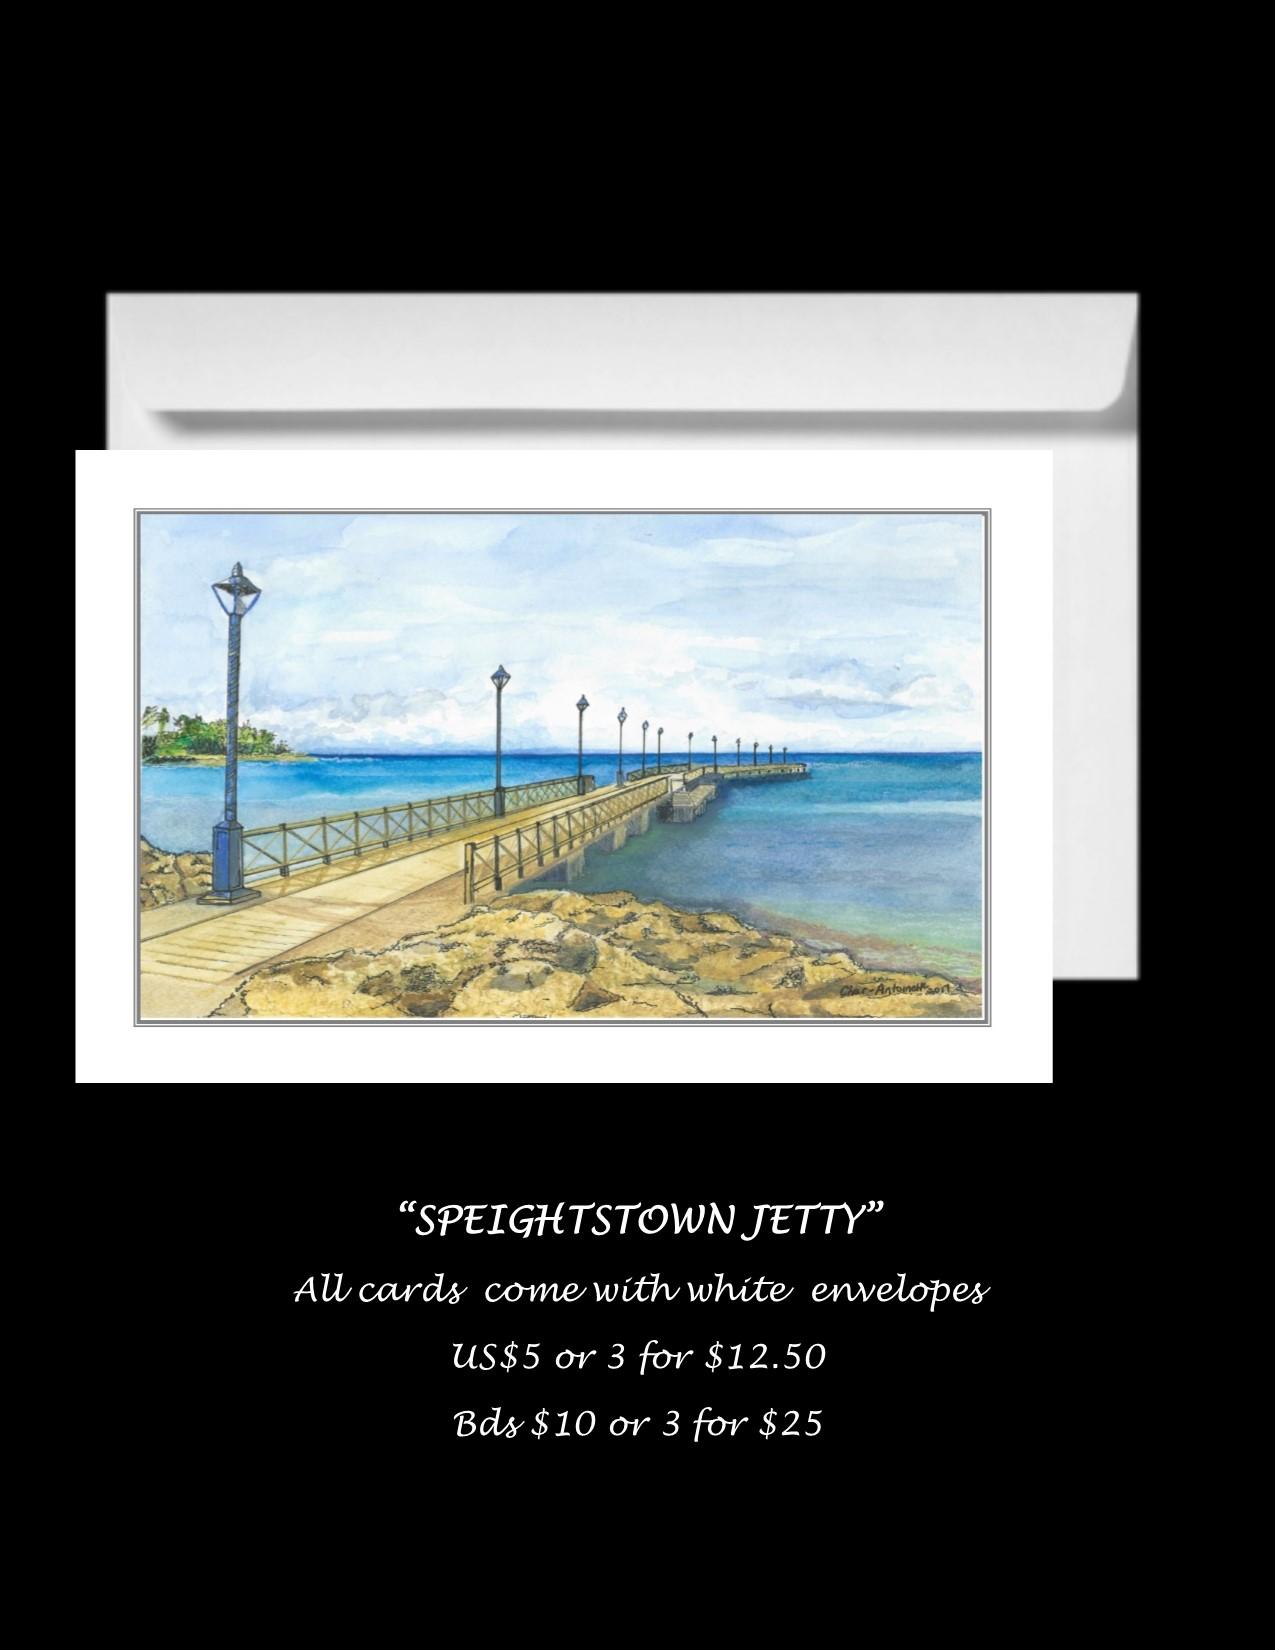 Jetty-19